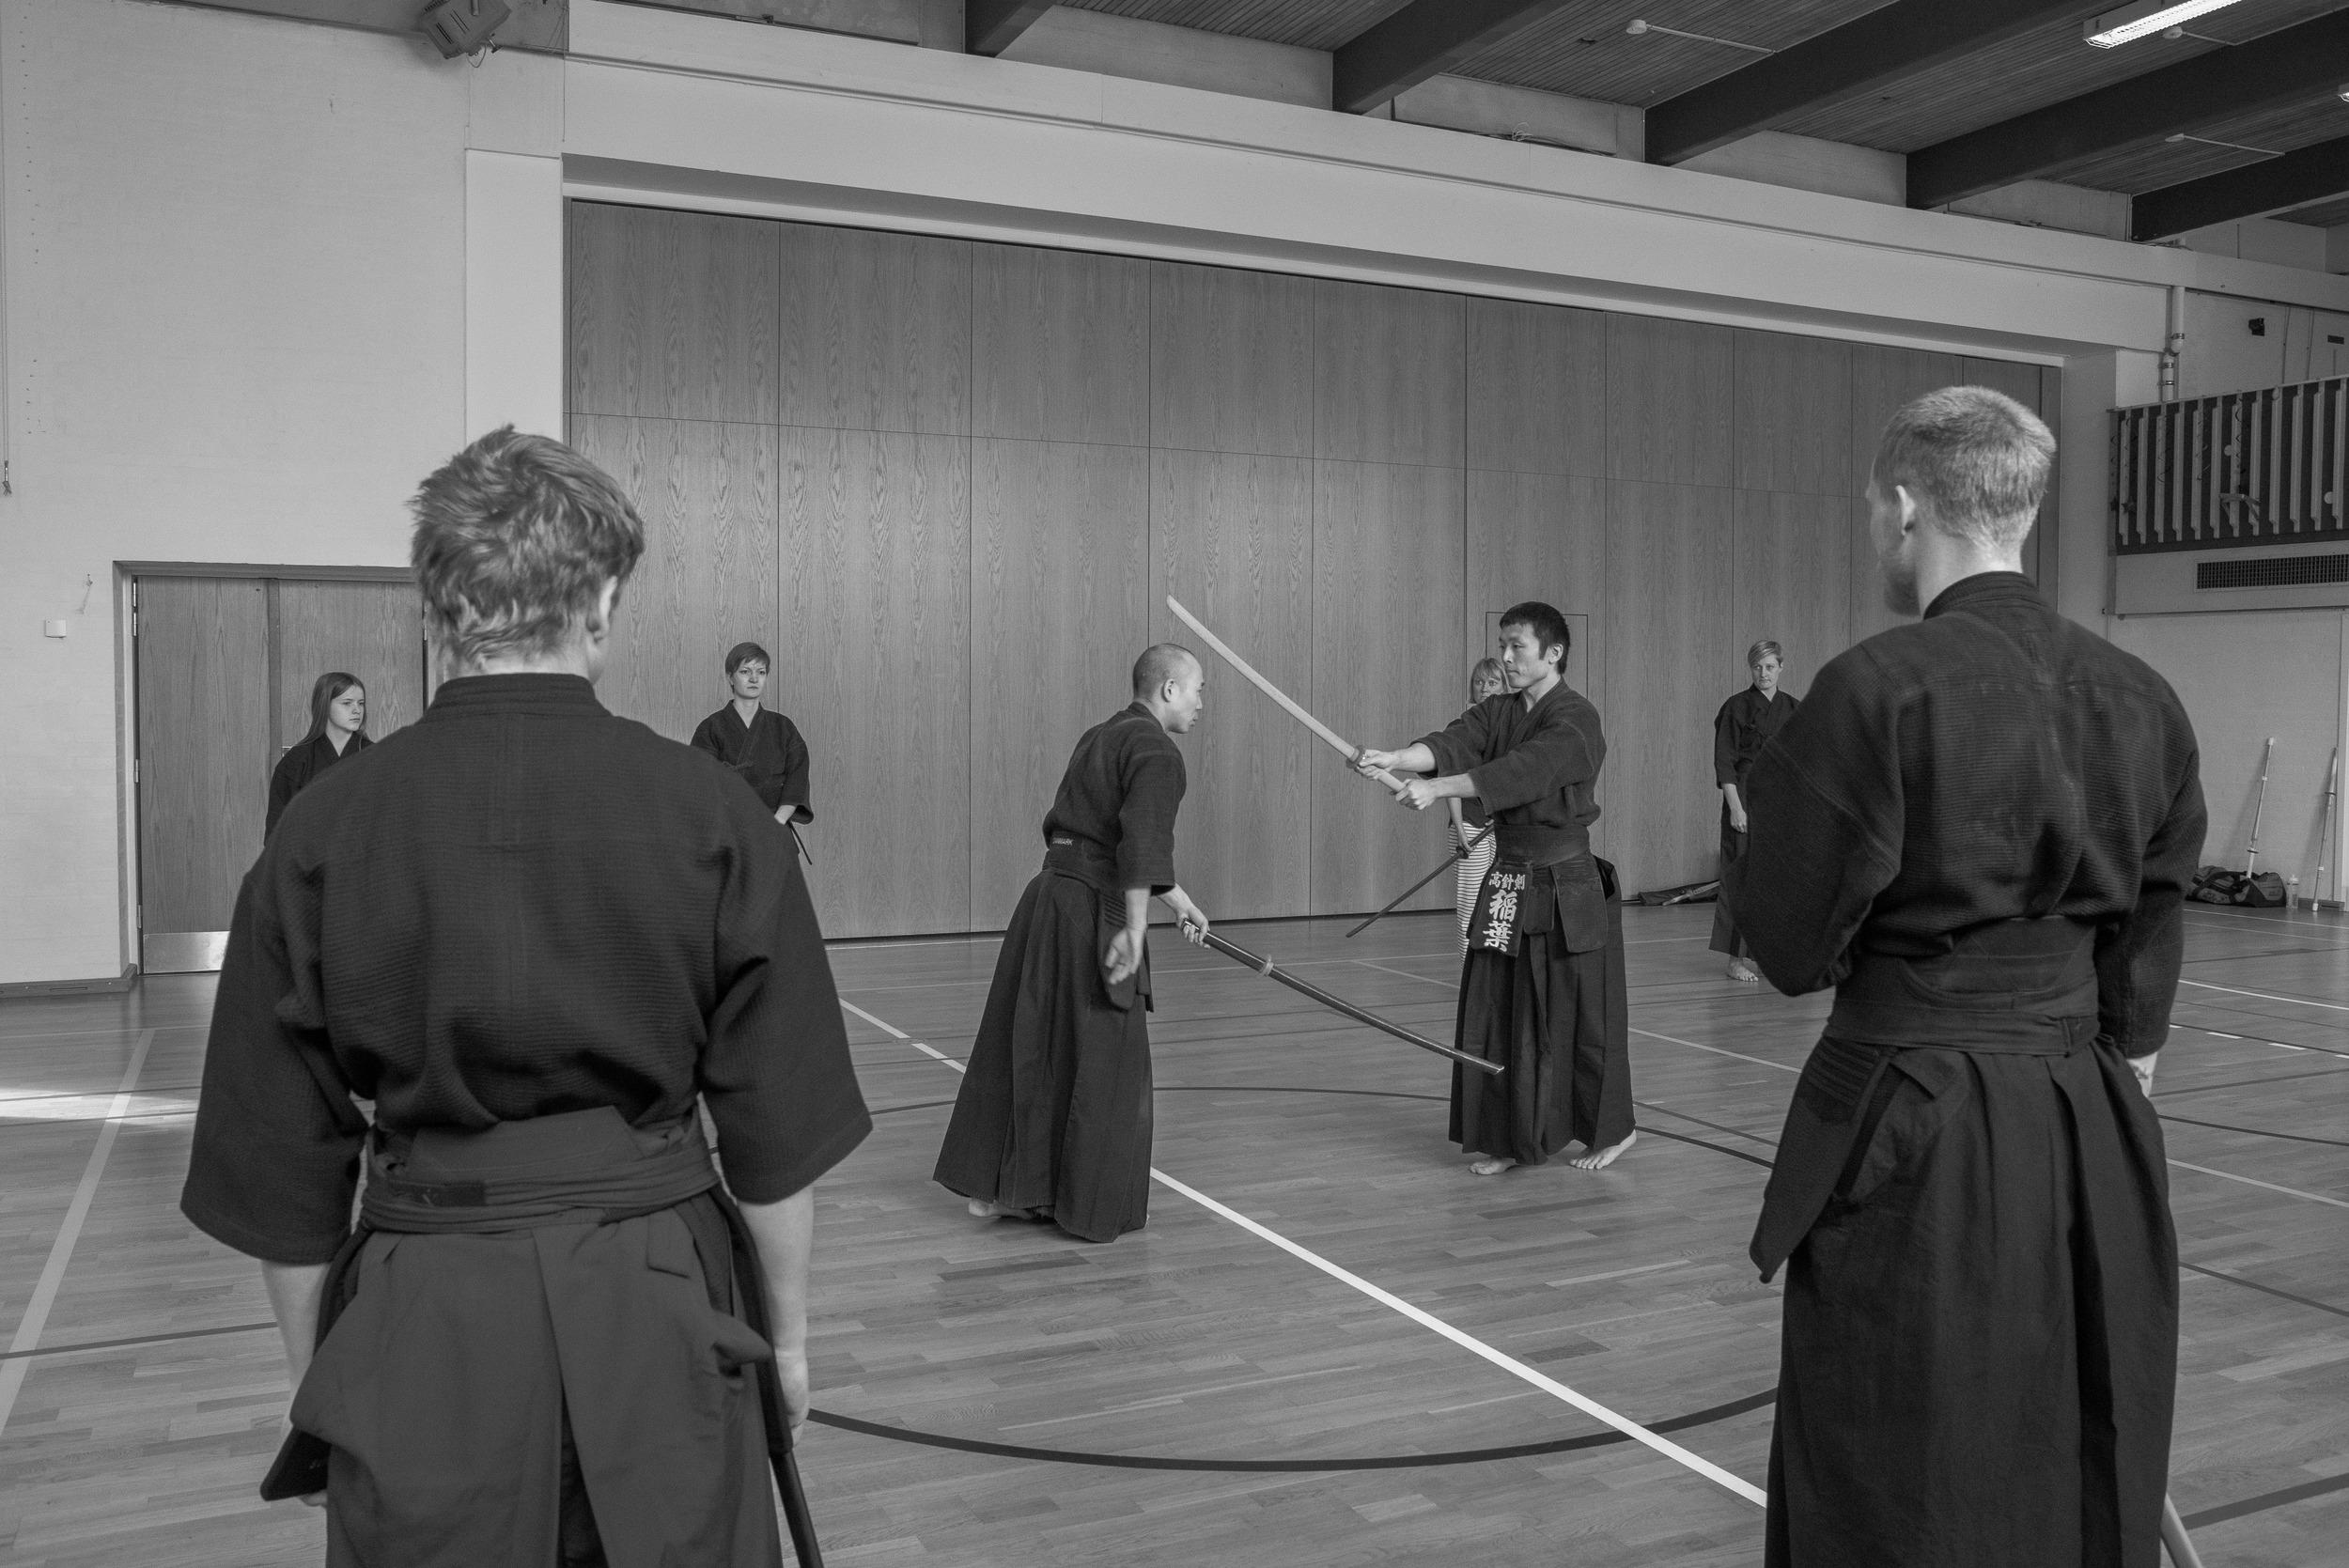 Yosuke Ueda og Masanori Inaba demonstrerer kata ipponme